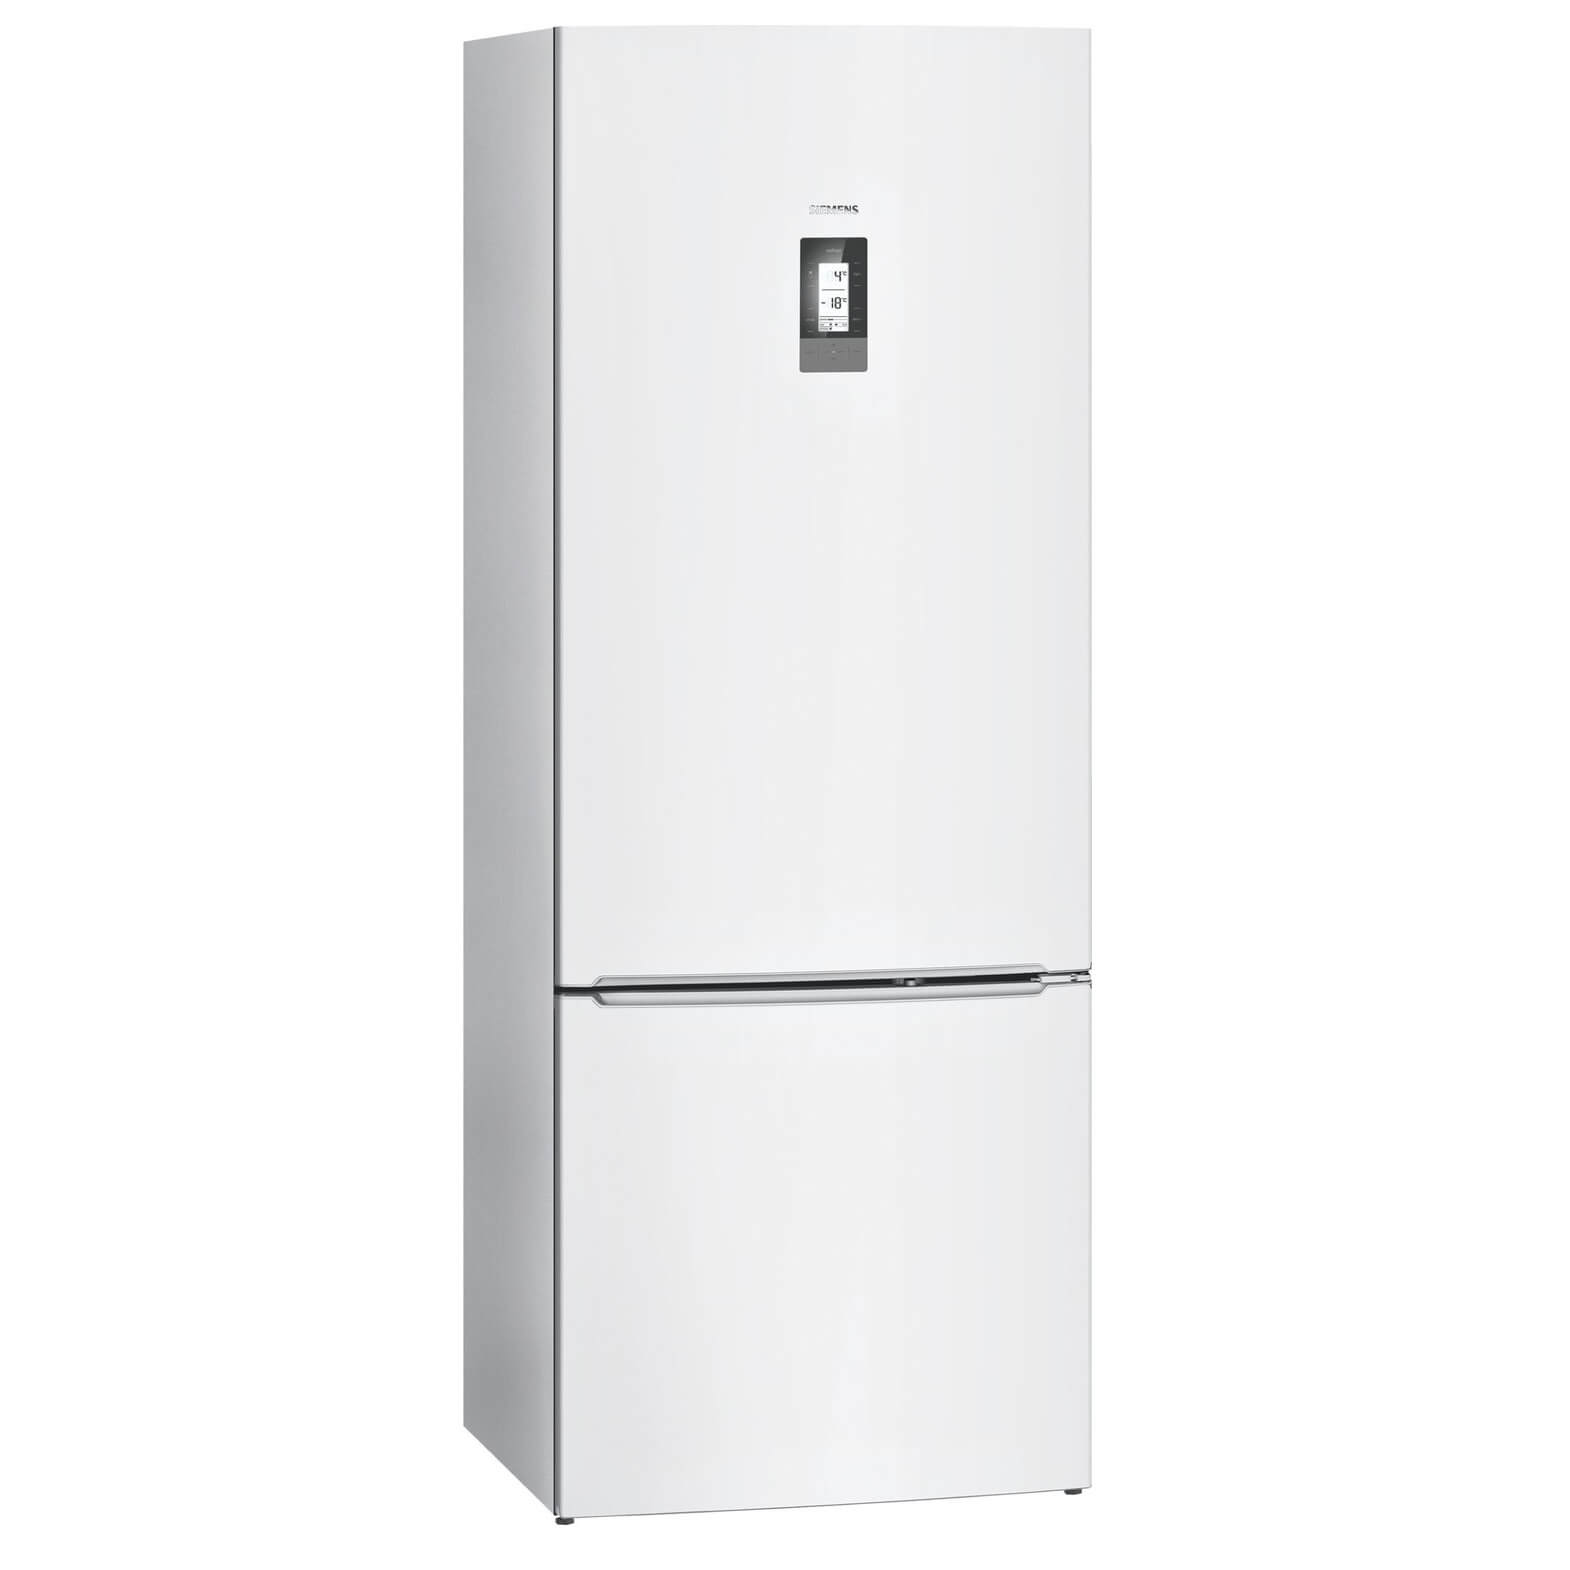 Siemens KG57NPW23N buzdolabi